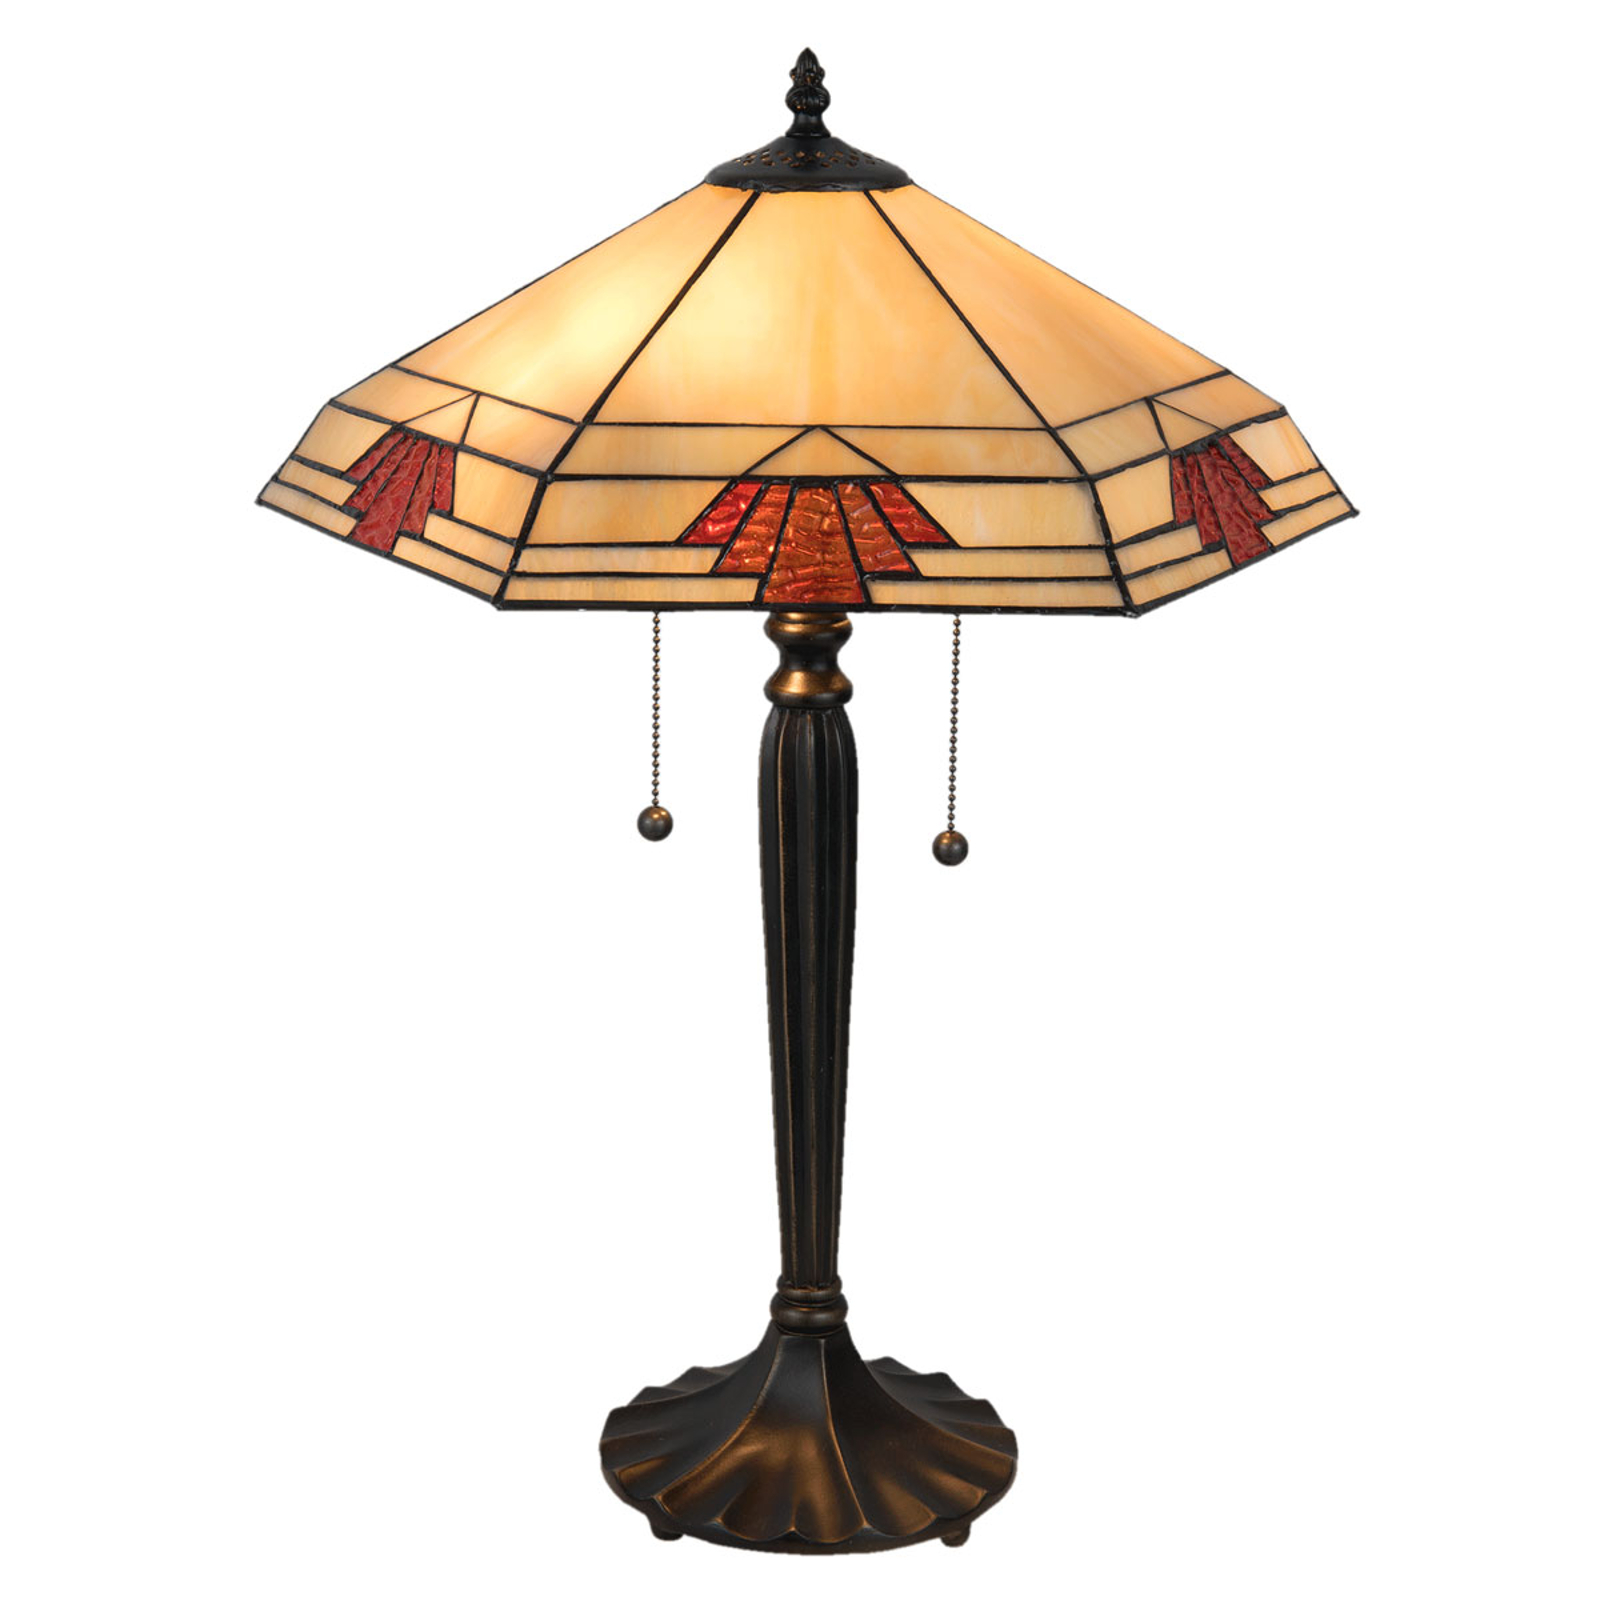 Lampe à poser 5202 au style Tiffany, 44x38cm